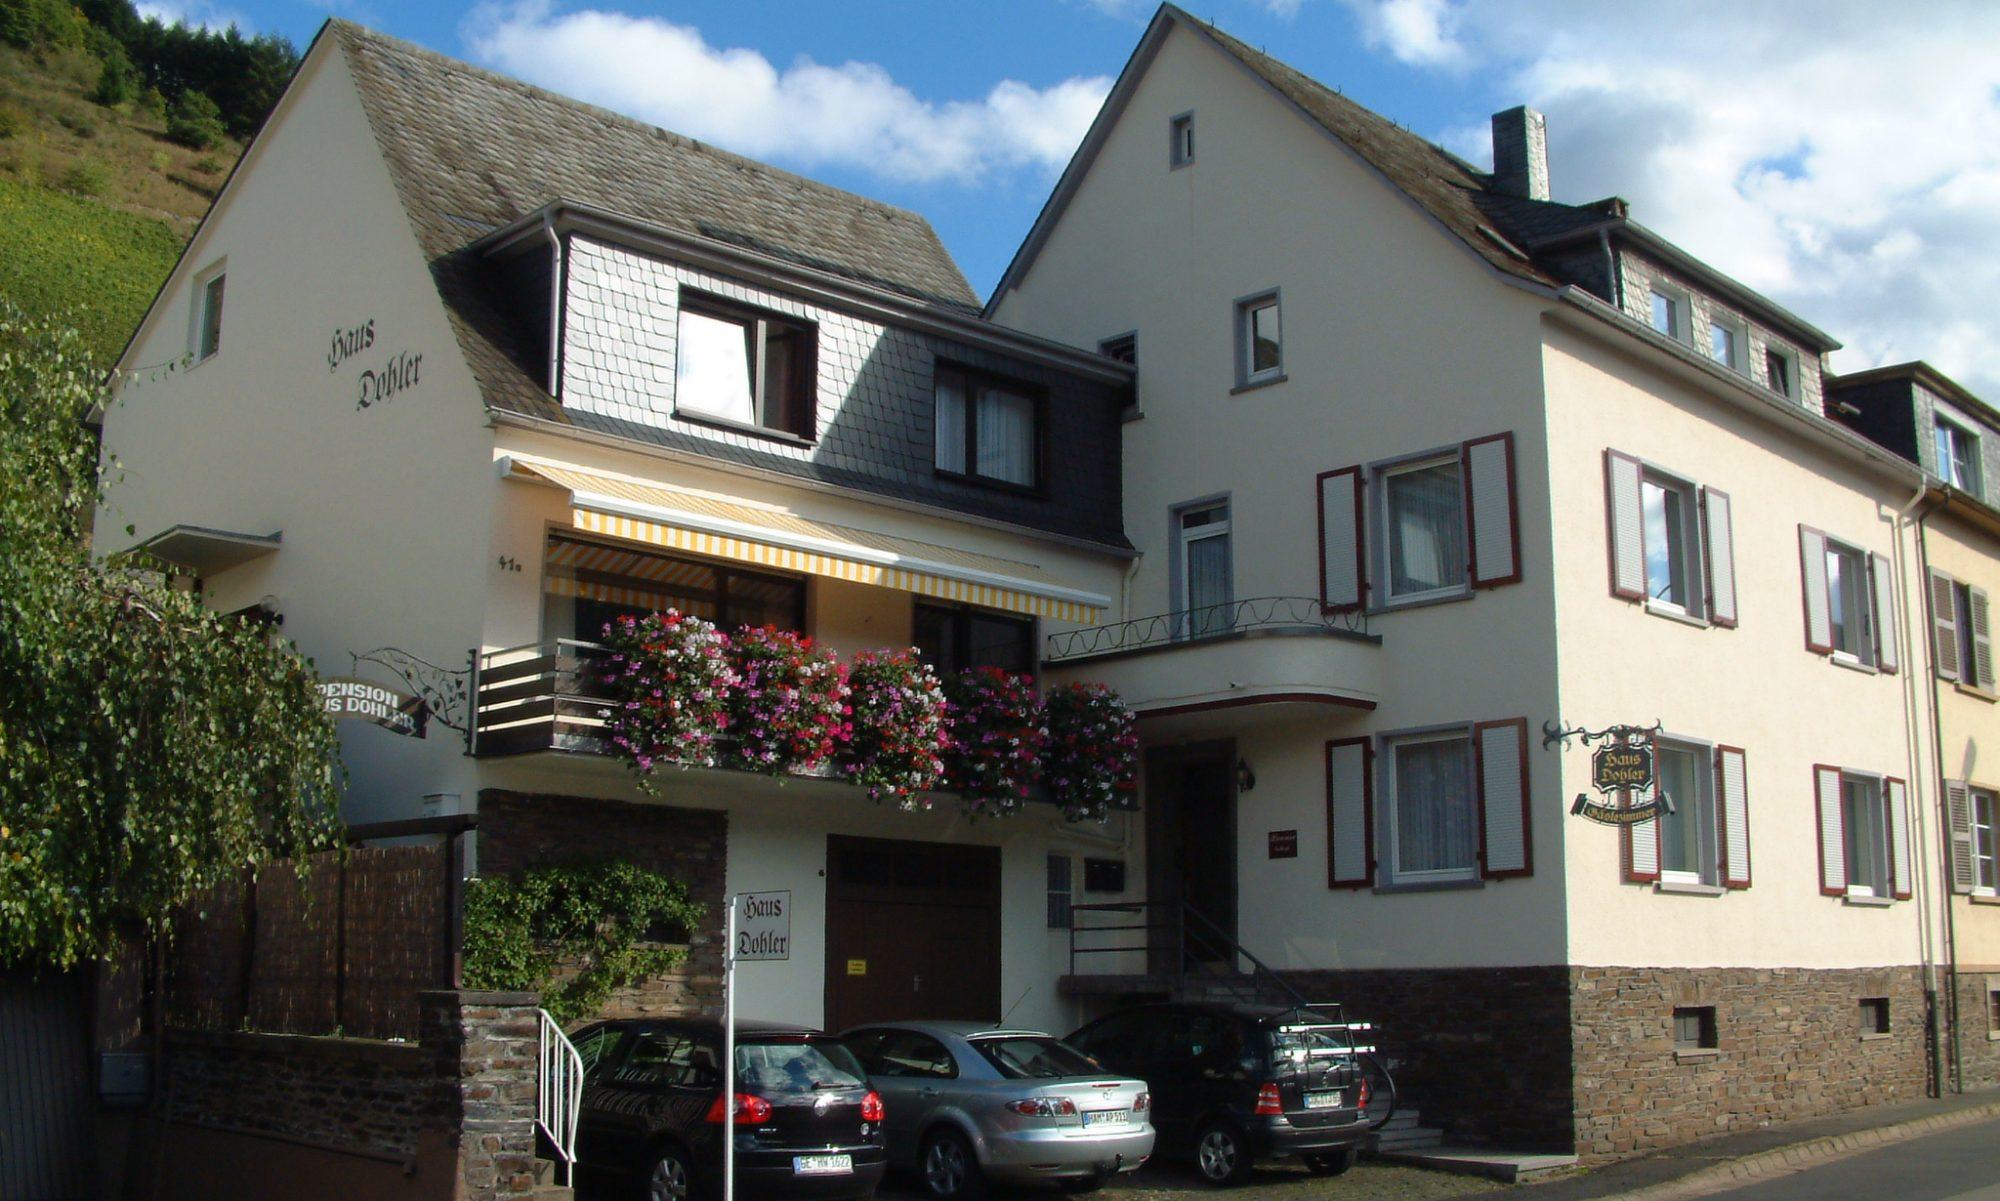 Haus Dohler